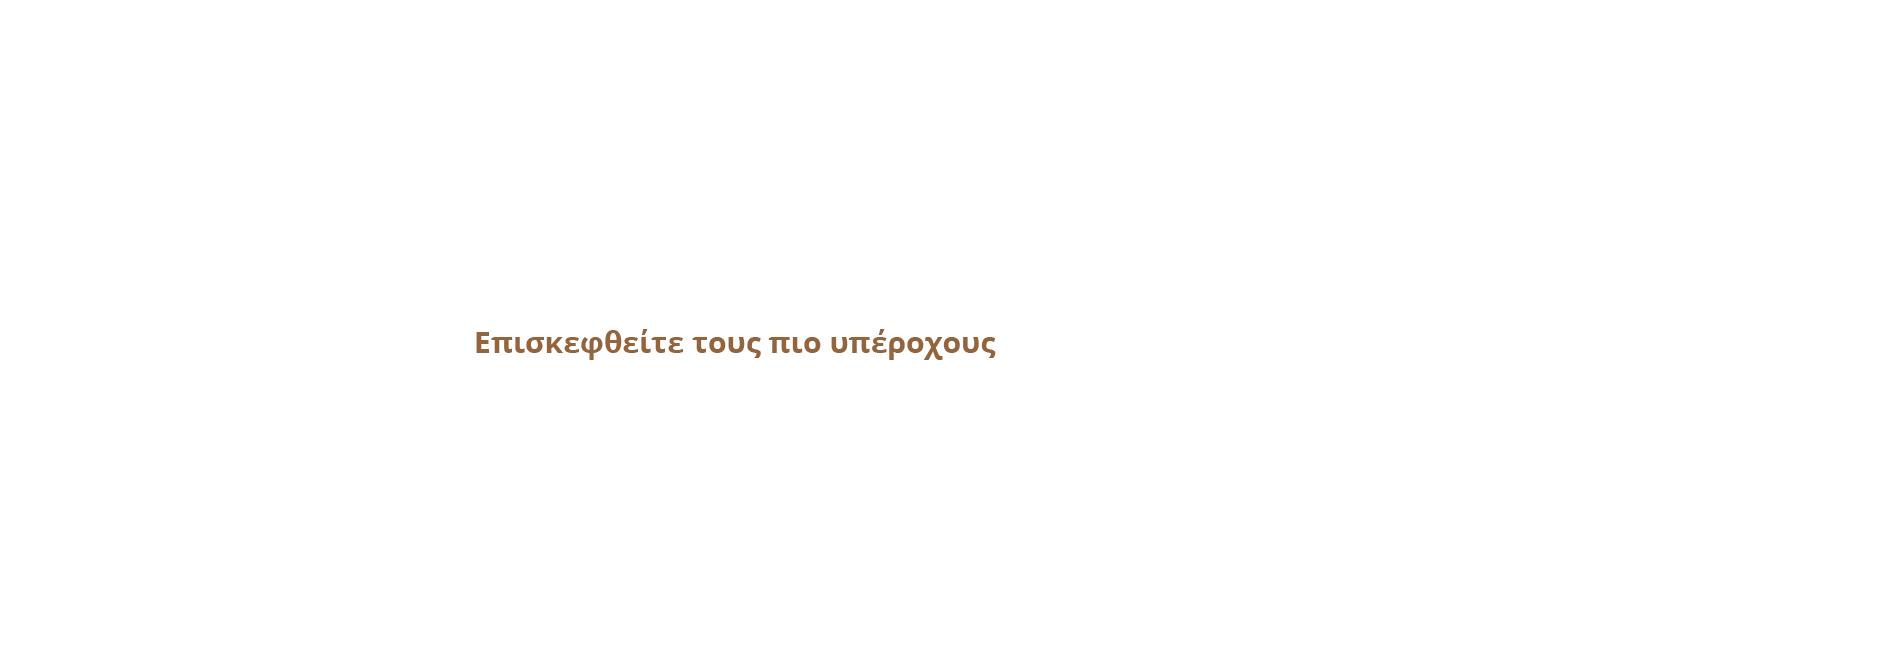 Caption1 slide_6 ancient greece